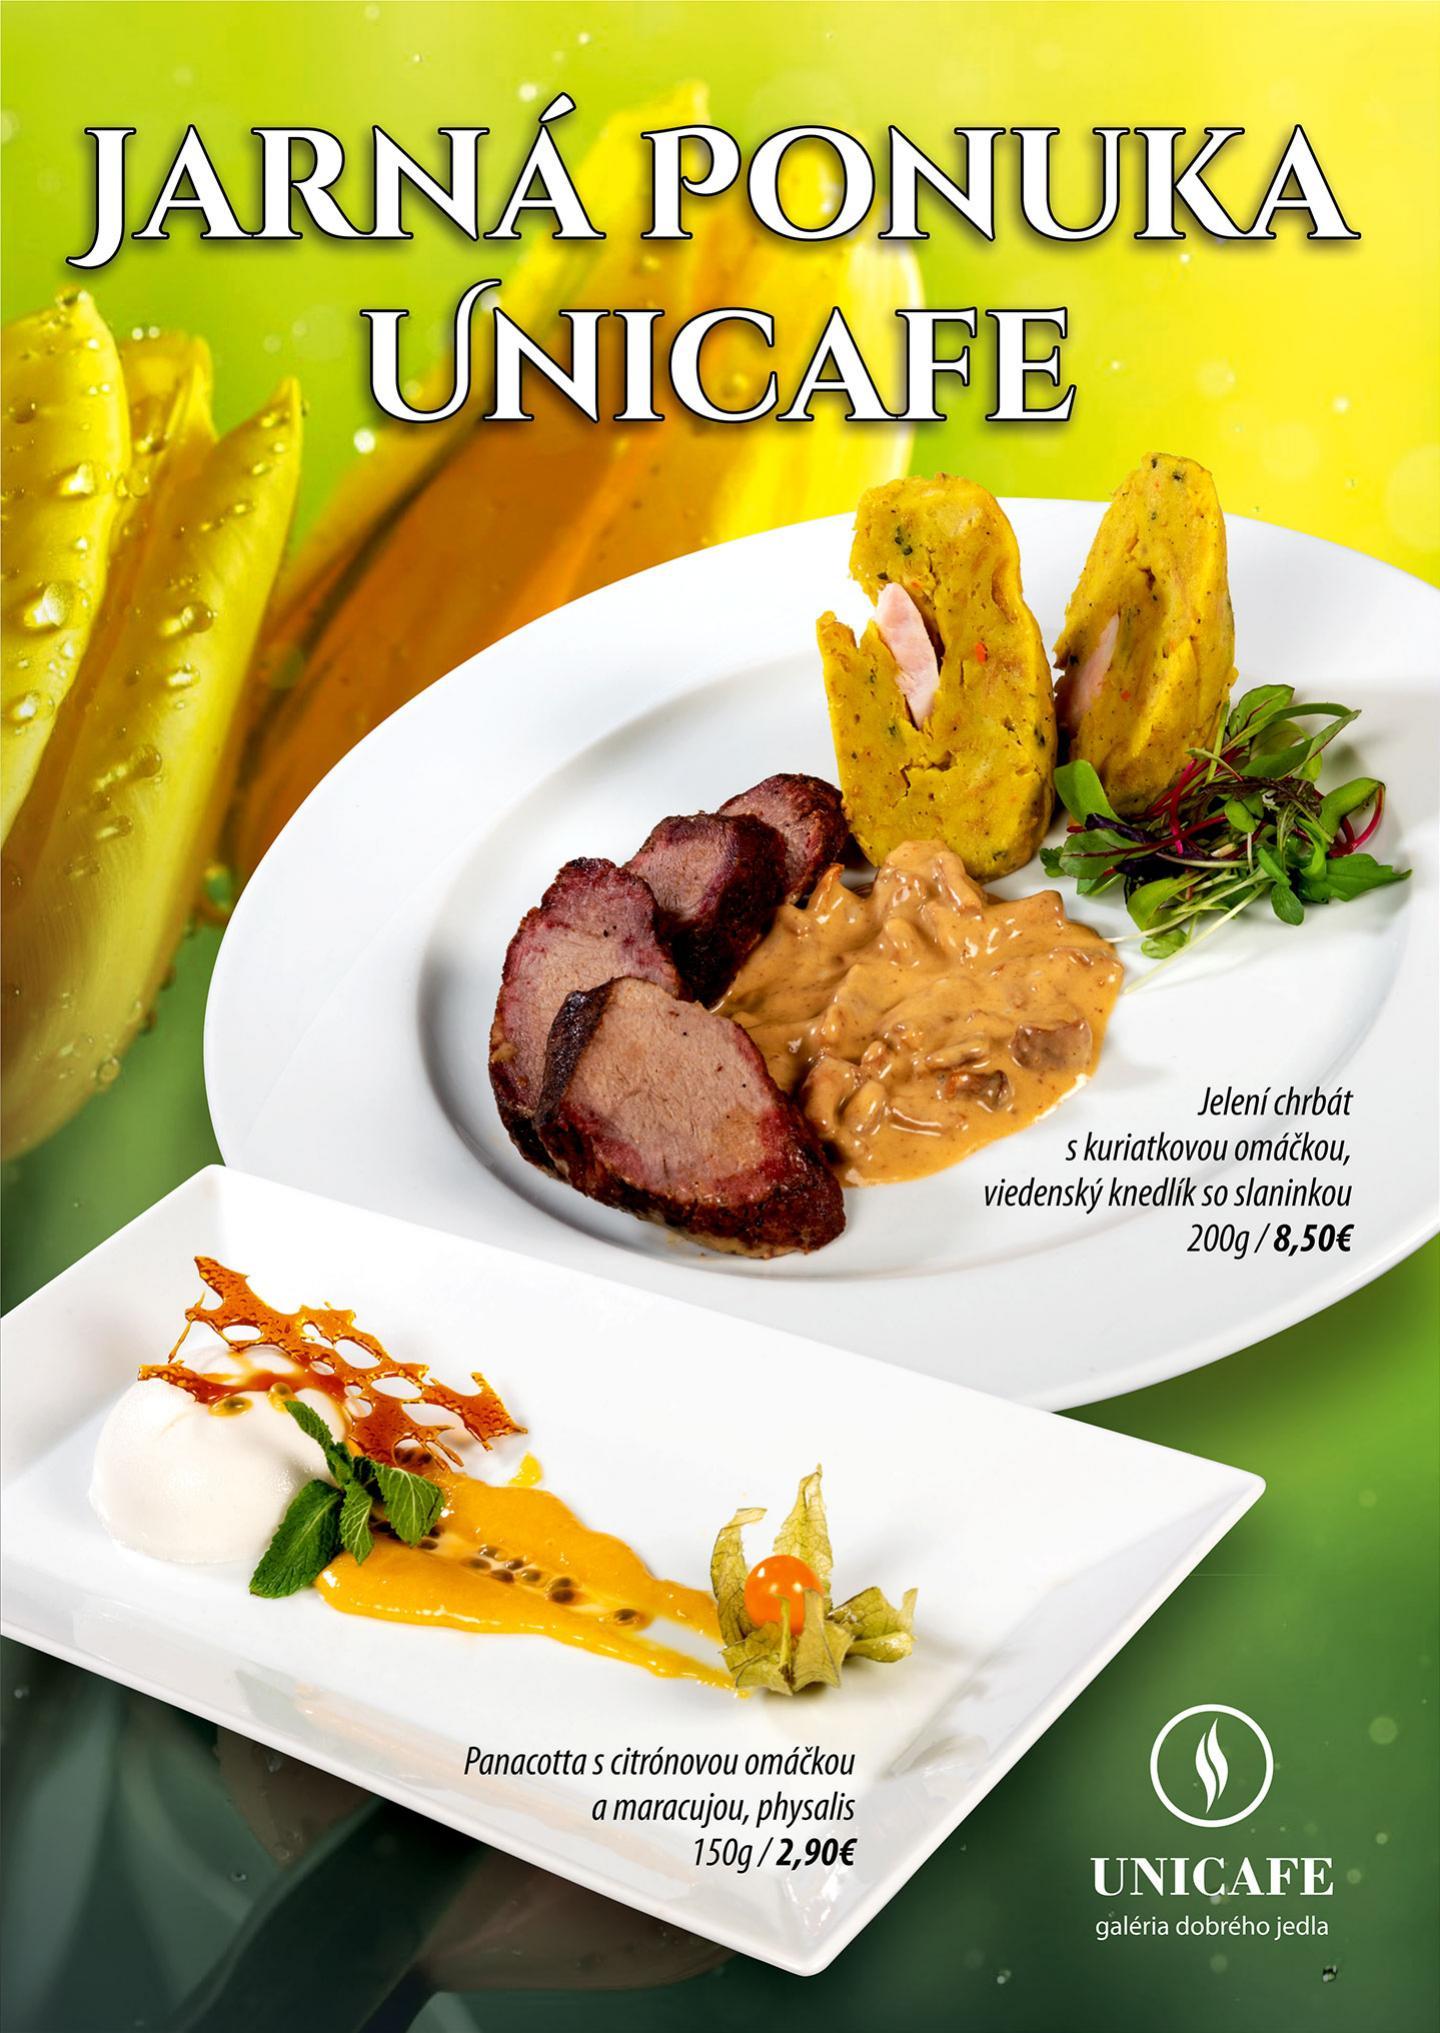 UNICAFE - jarn� ponuka